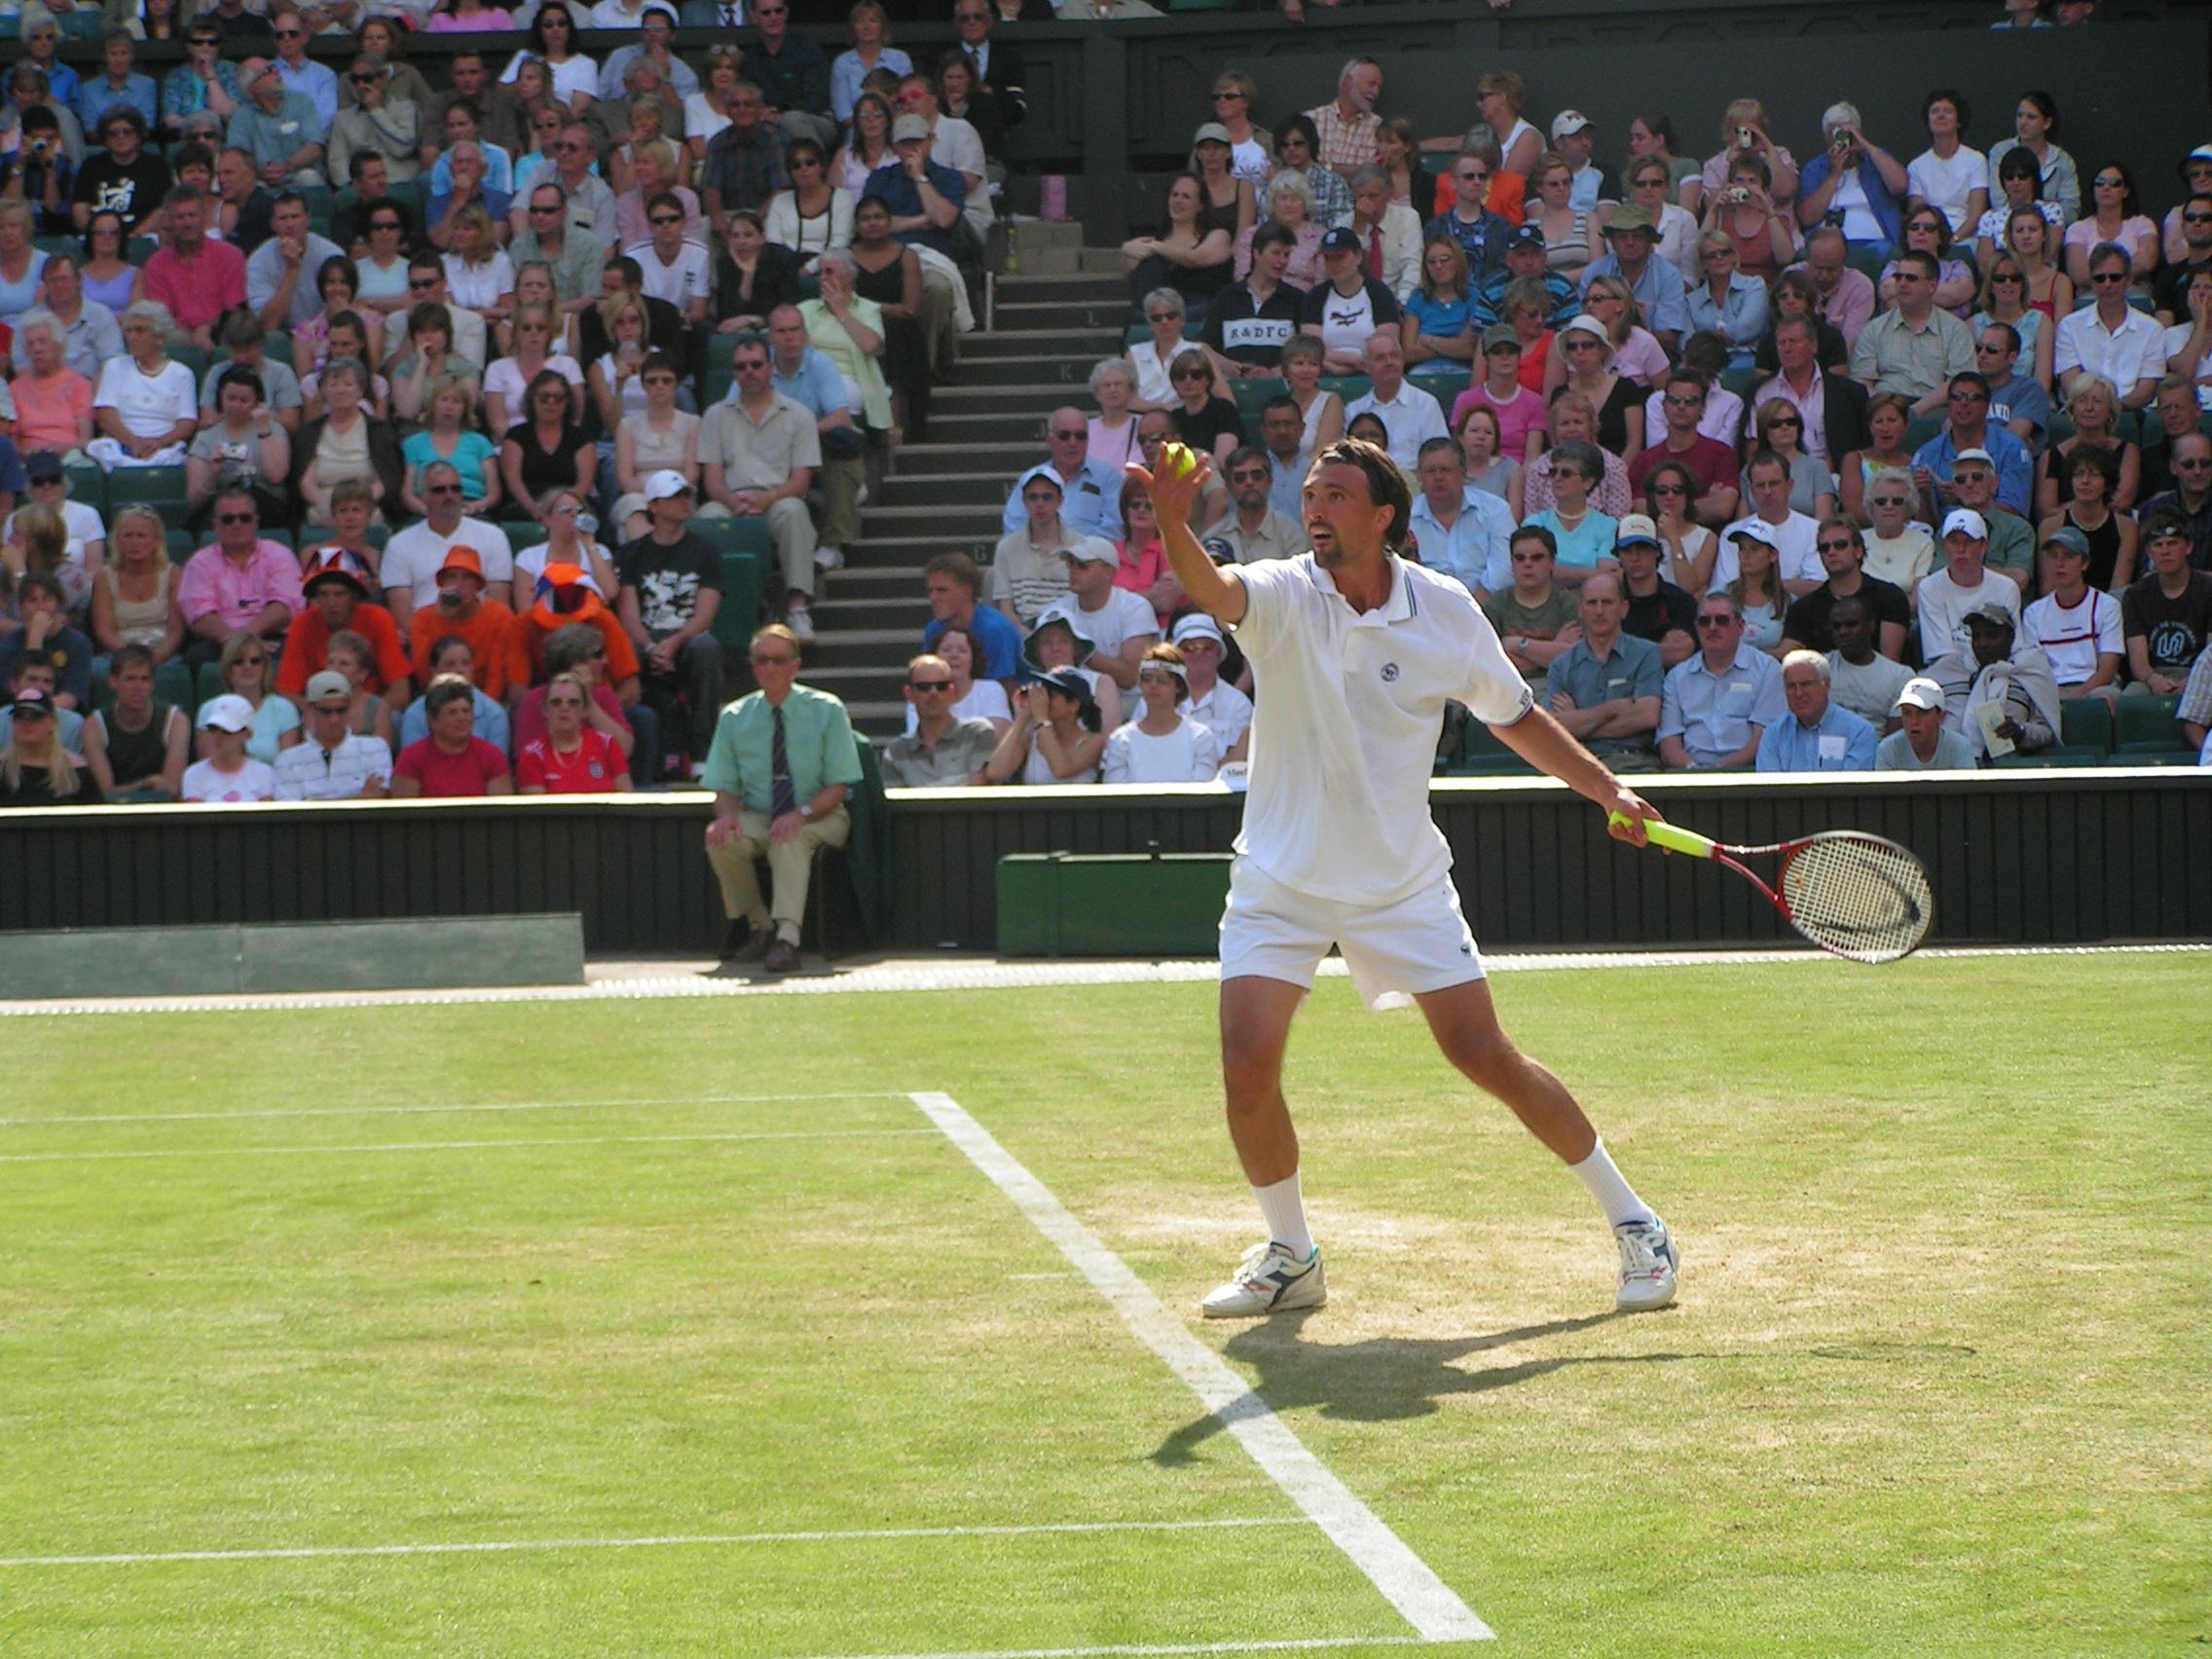 Quando Goran Ivanišević vinse Wimbledon